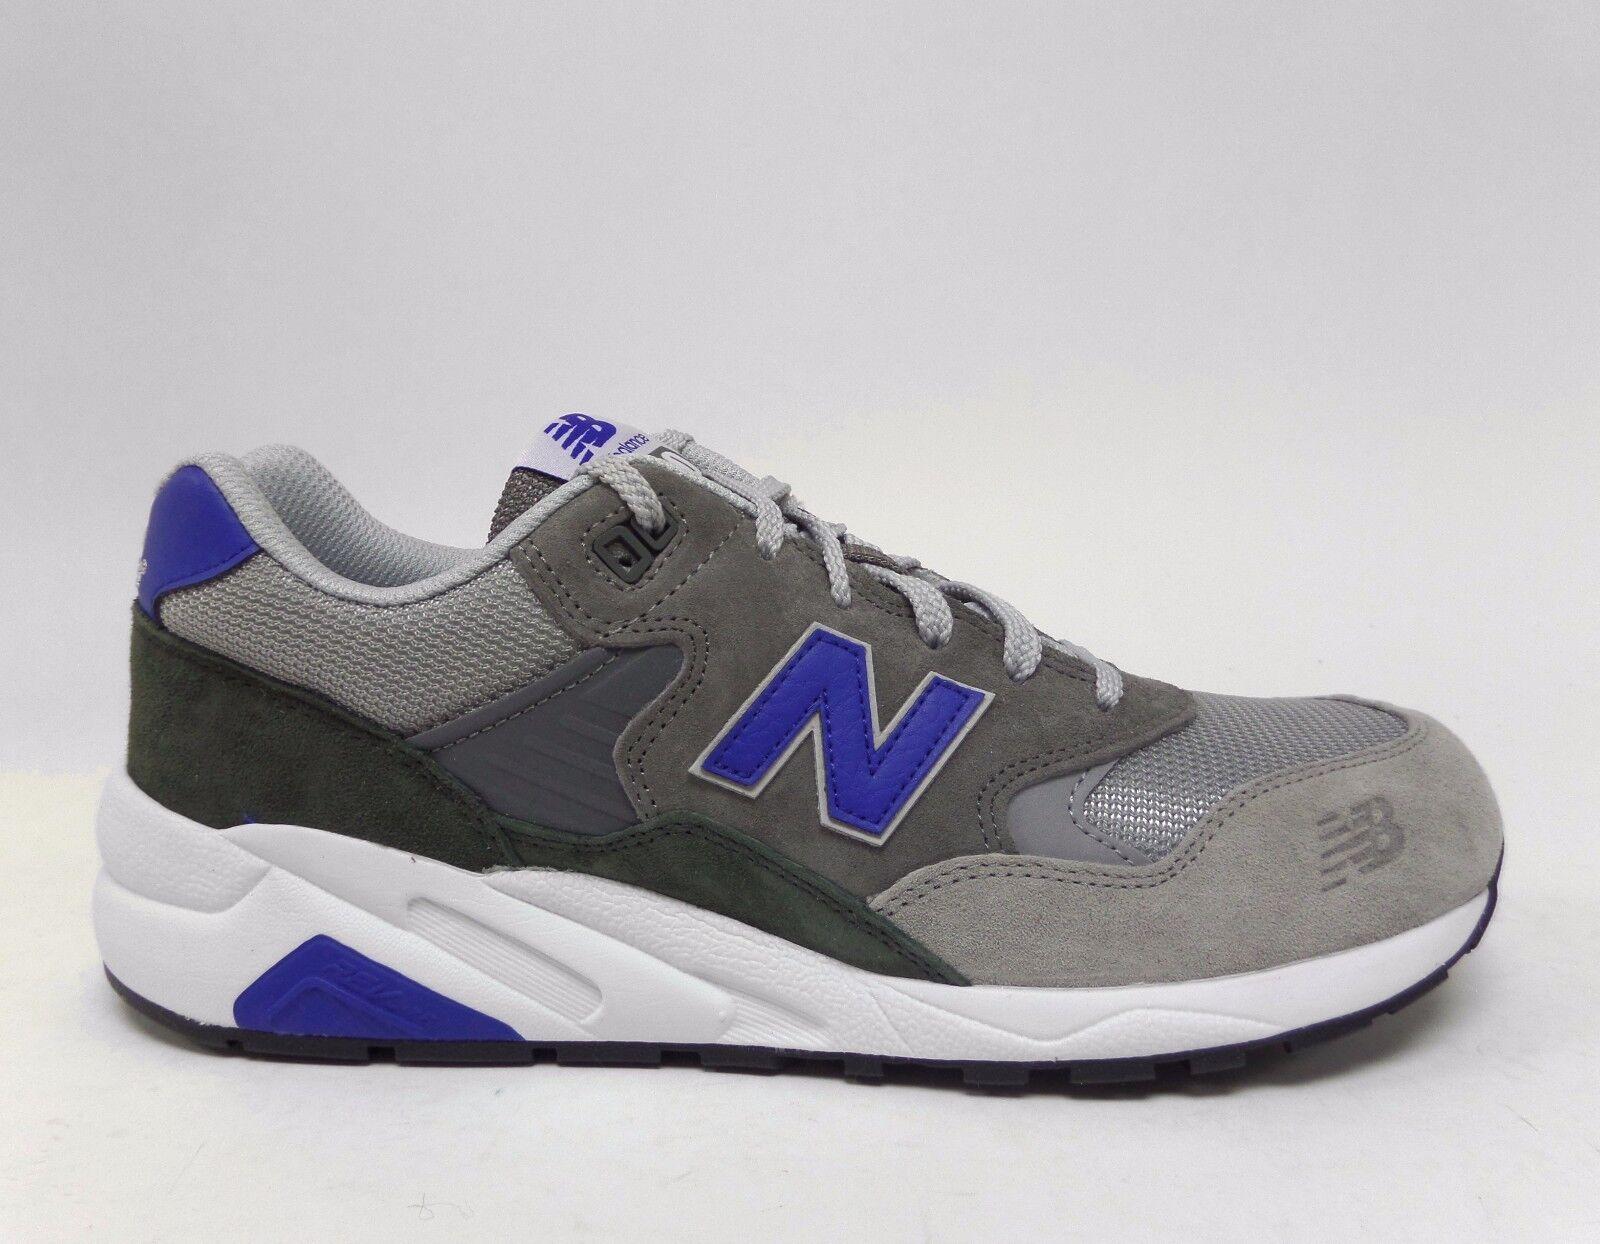 New Balance Men's 580 ELITE EDITION LOST CLASSICS shoes Dark Grey bluee MRT580LL